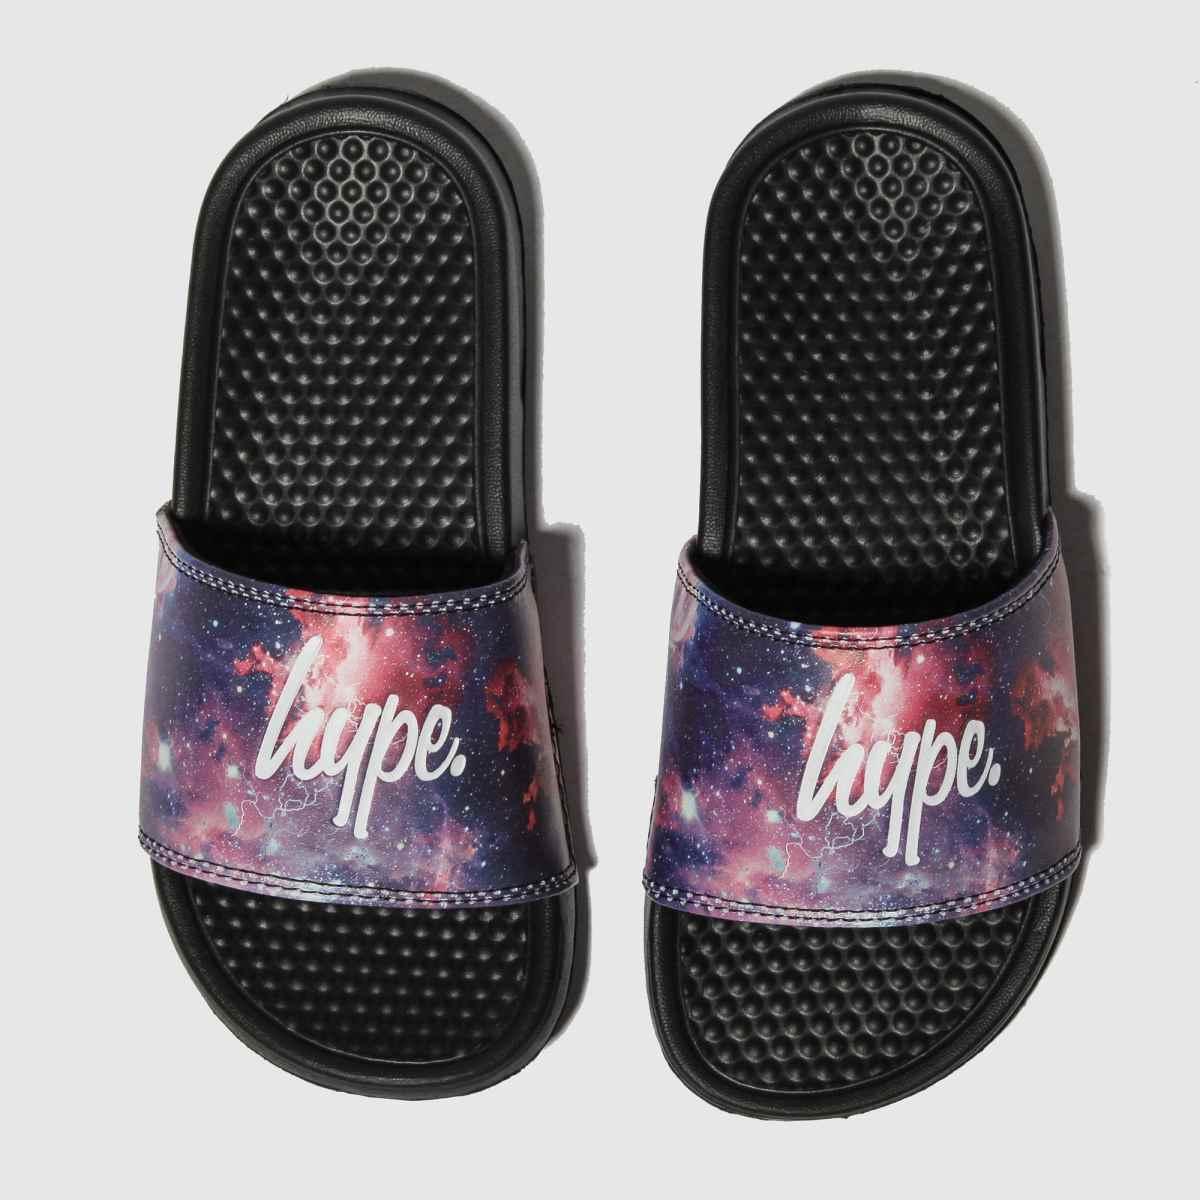 Hype Black & Purple Fired Up Sliders Sandals Junior